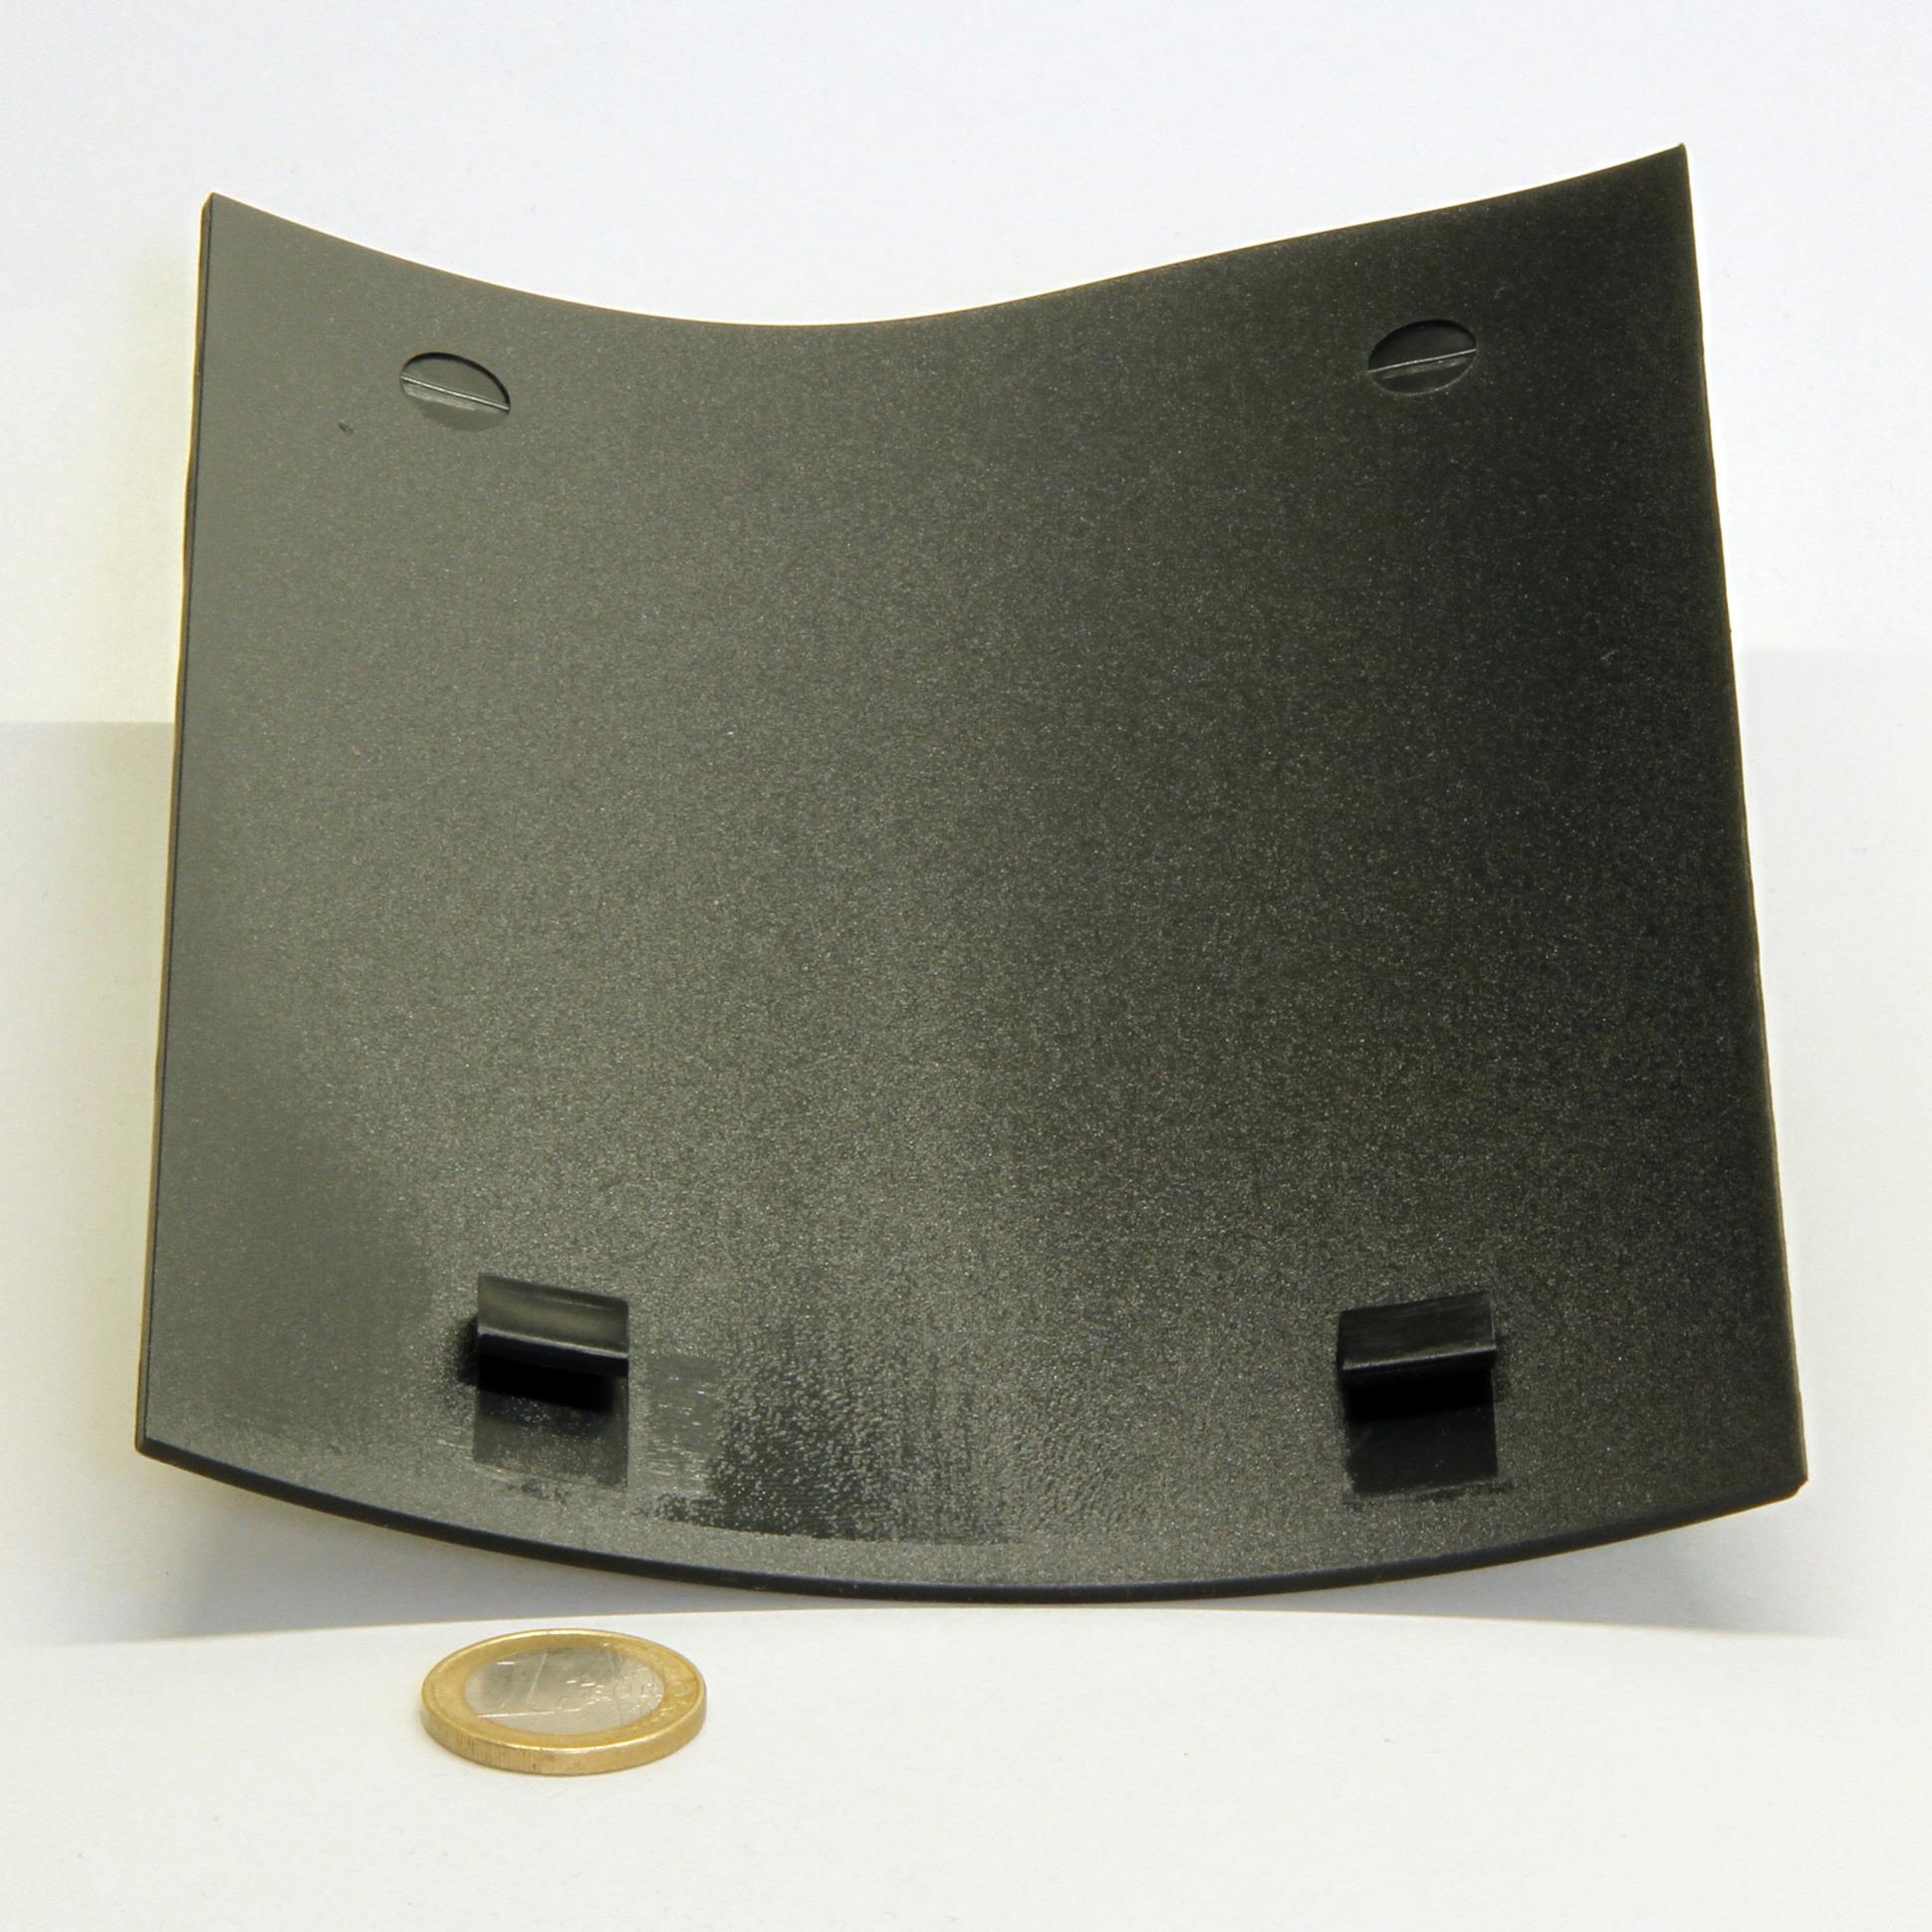 jbl cristalprofi m greenline service cover. Black Bedroom Furniture Sets. Home Design Ideas